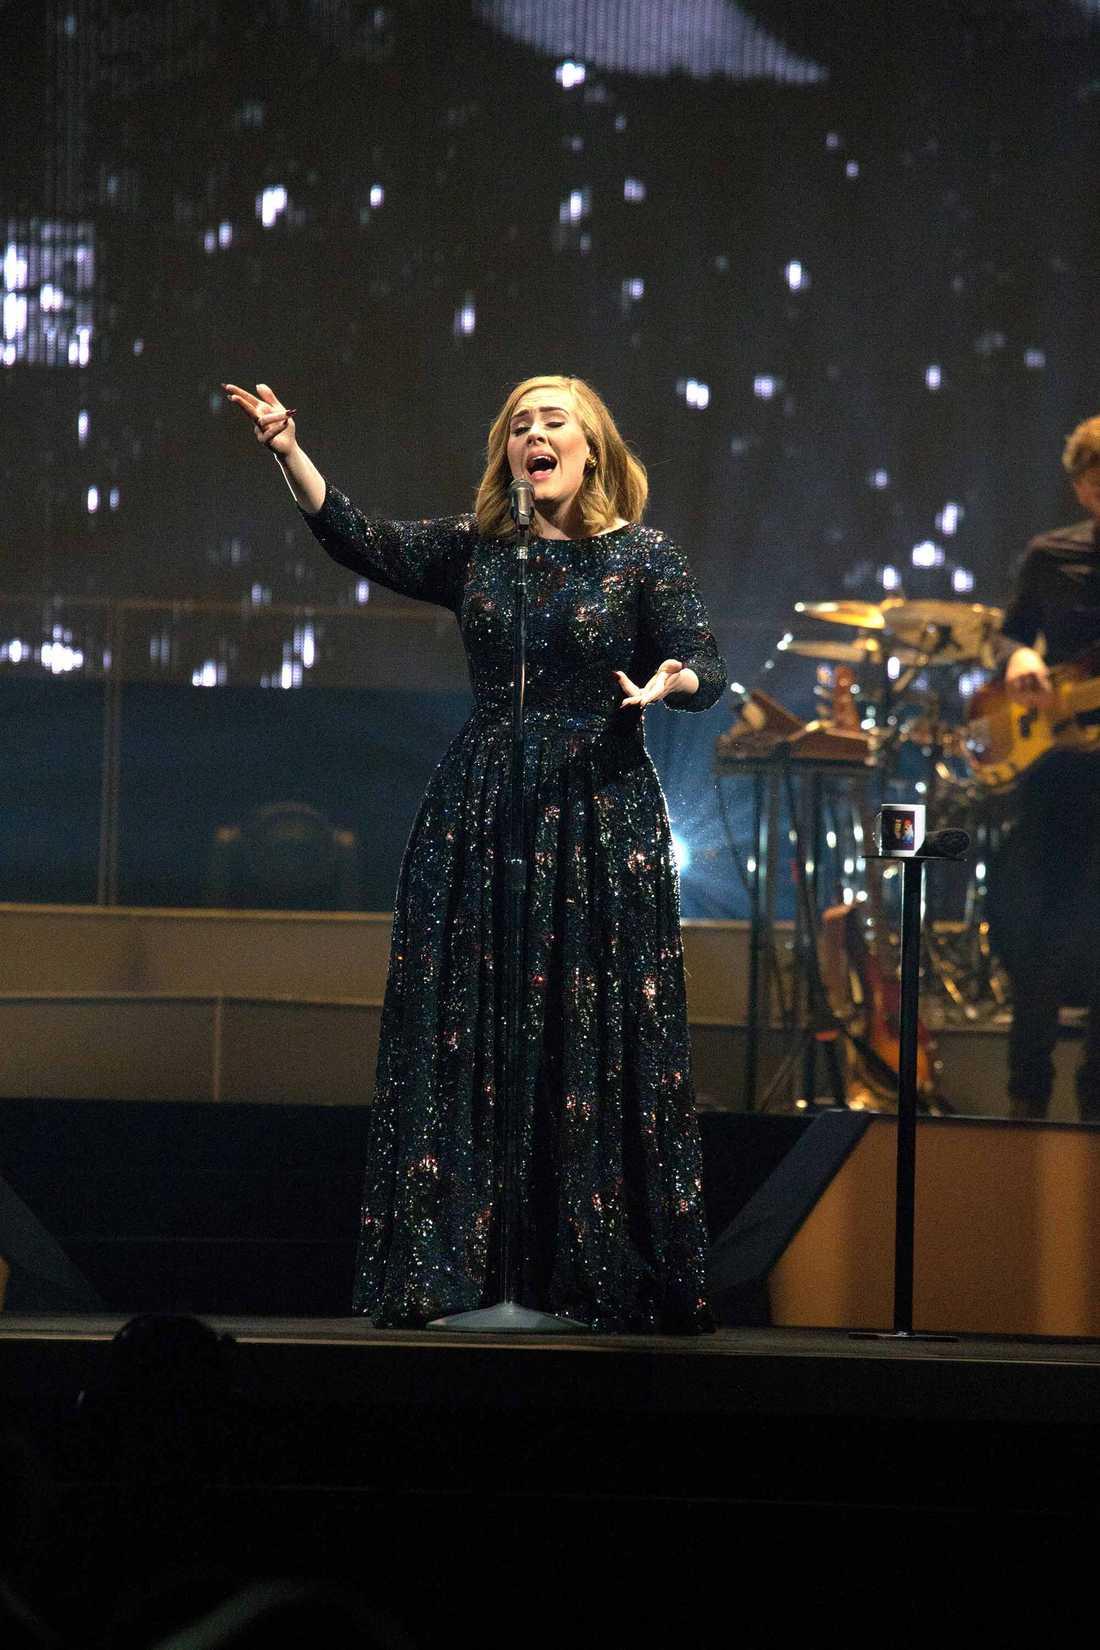 Adele i Tele 2 Arena, Stockholm.